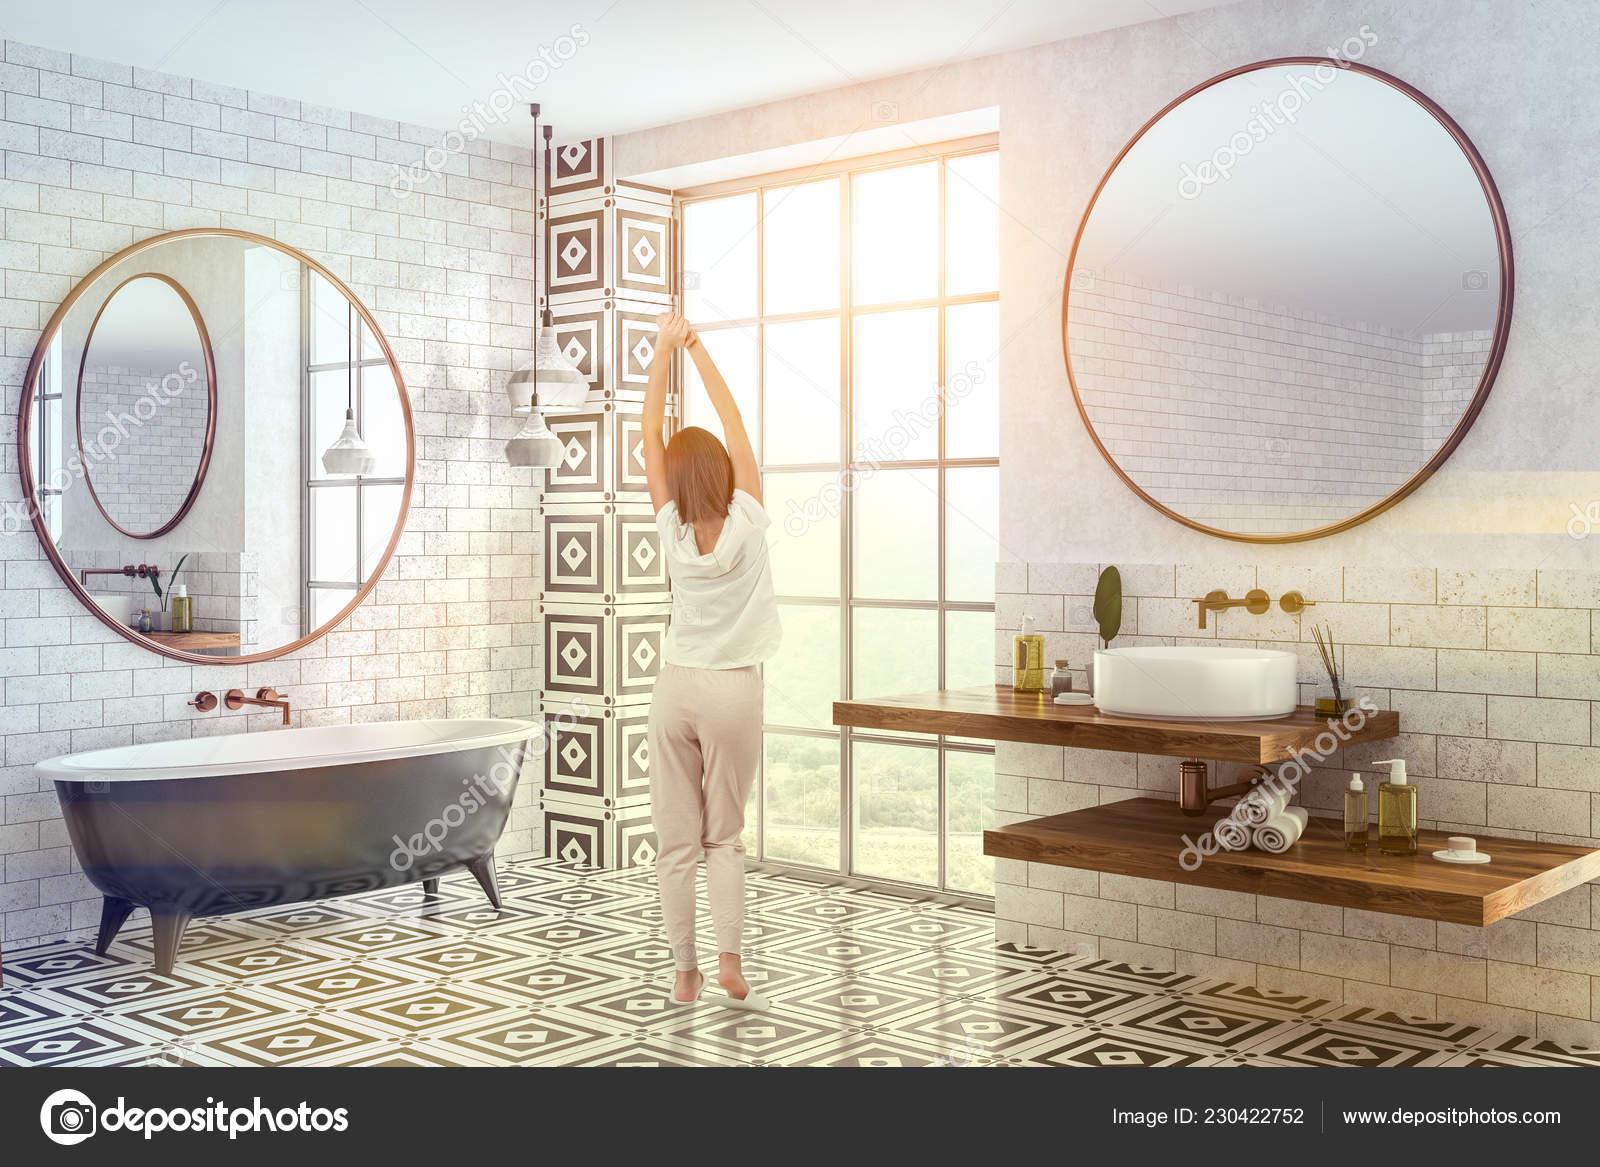 Mujer Interior Cuarto Baño Moderno Con Paredes Ladrillo ...